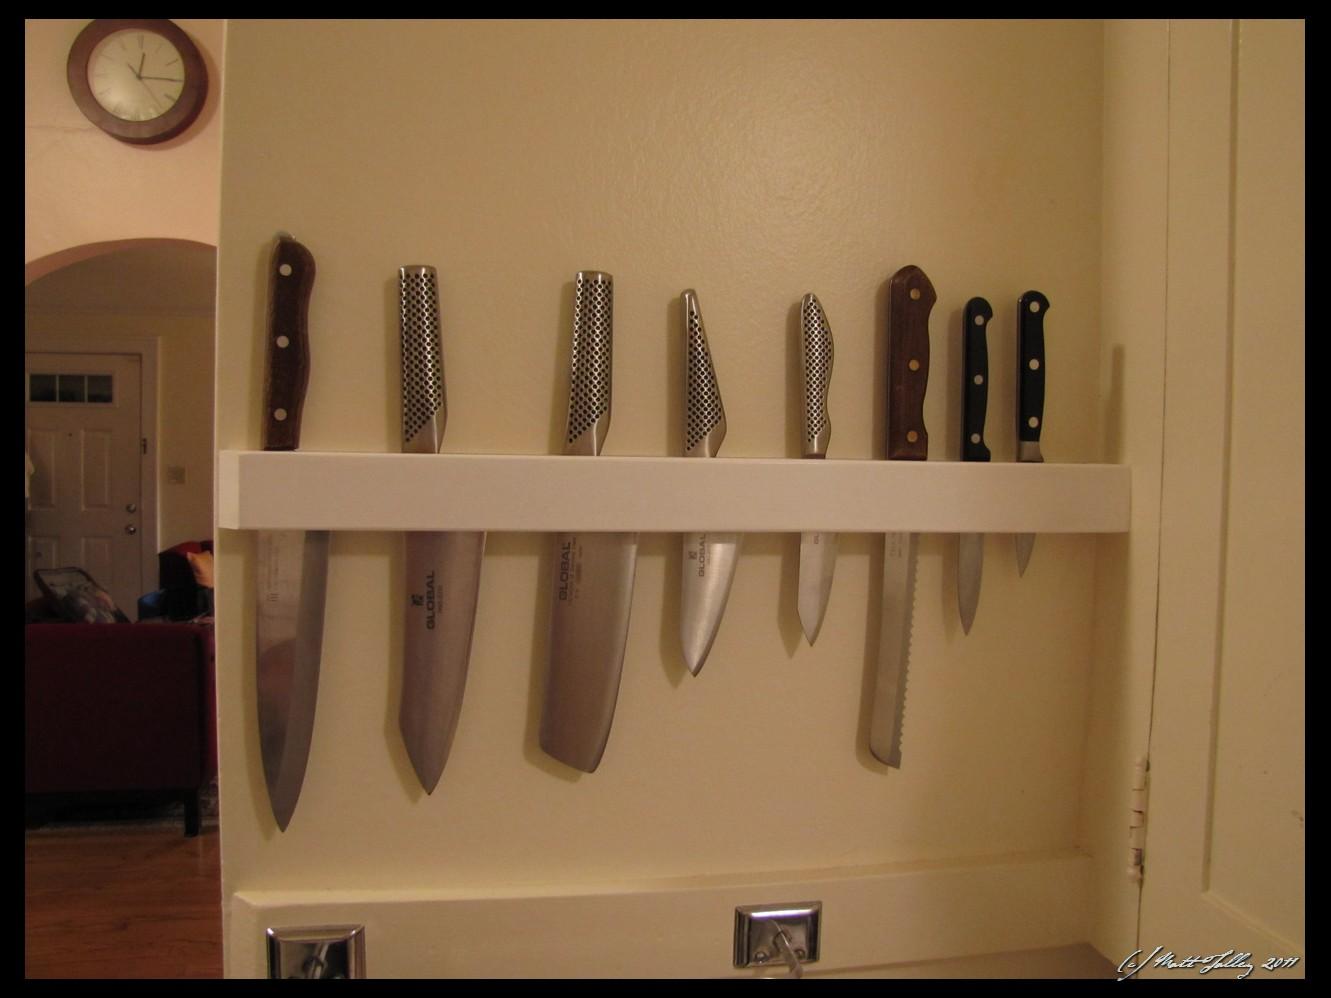 Kitchen Knife Holders. Kitchen Knife Holders